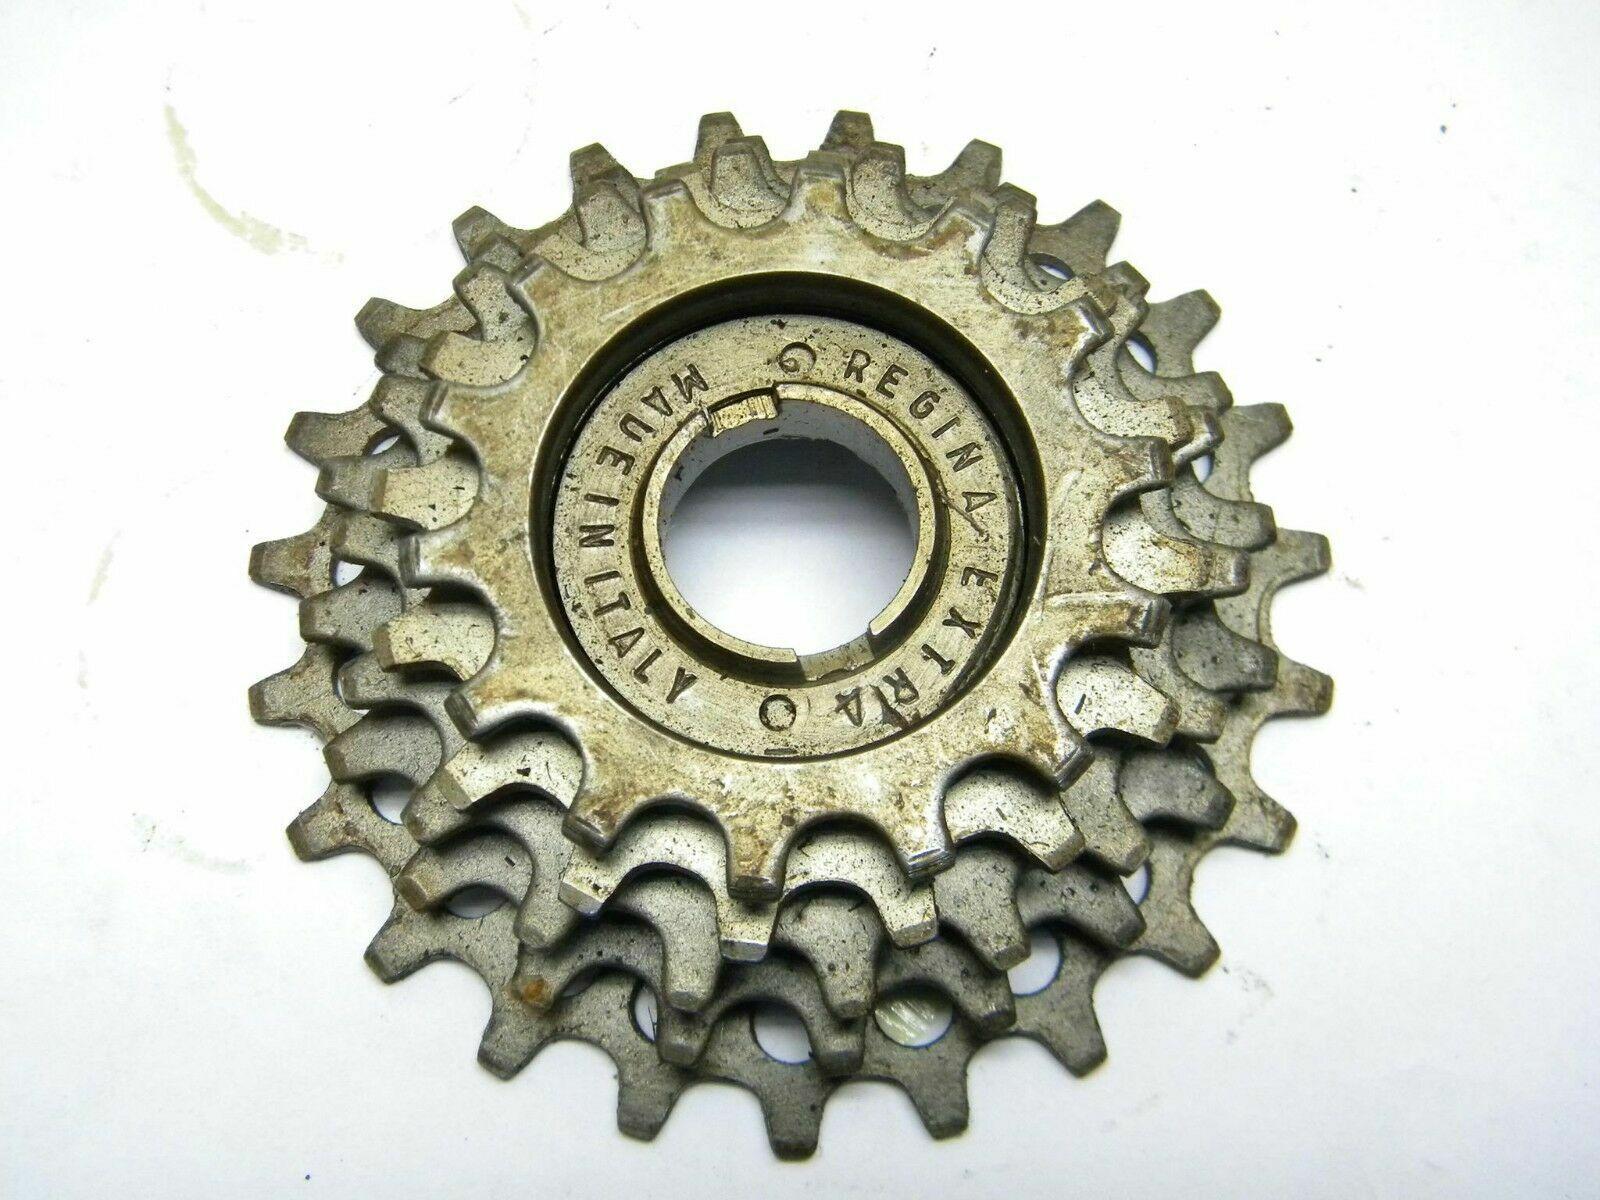 Vintage Regina Extra Freewheel Bike Bicycle  5 Speed 14-23 NOS (G60)  unique design